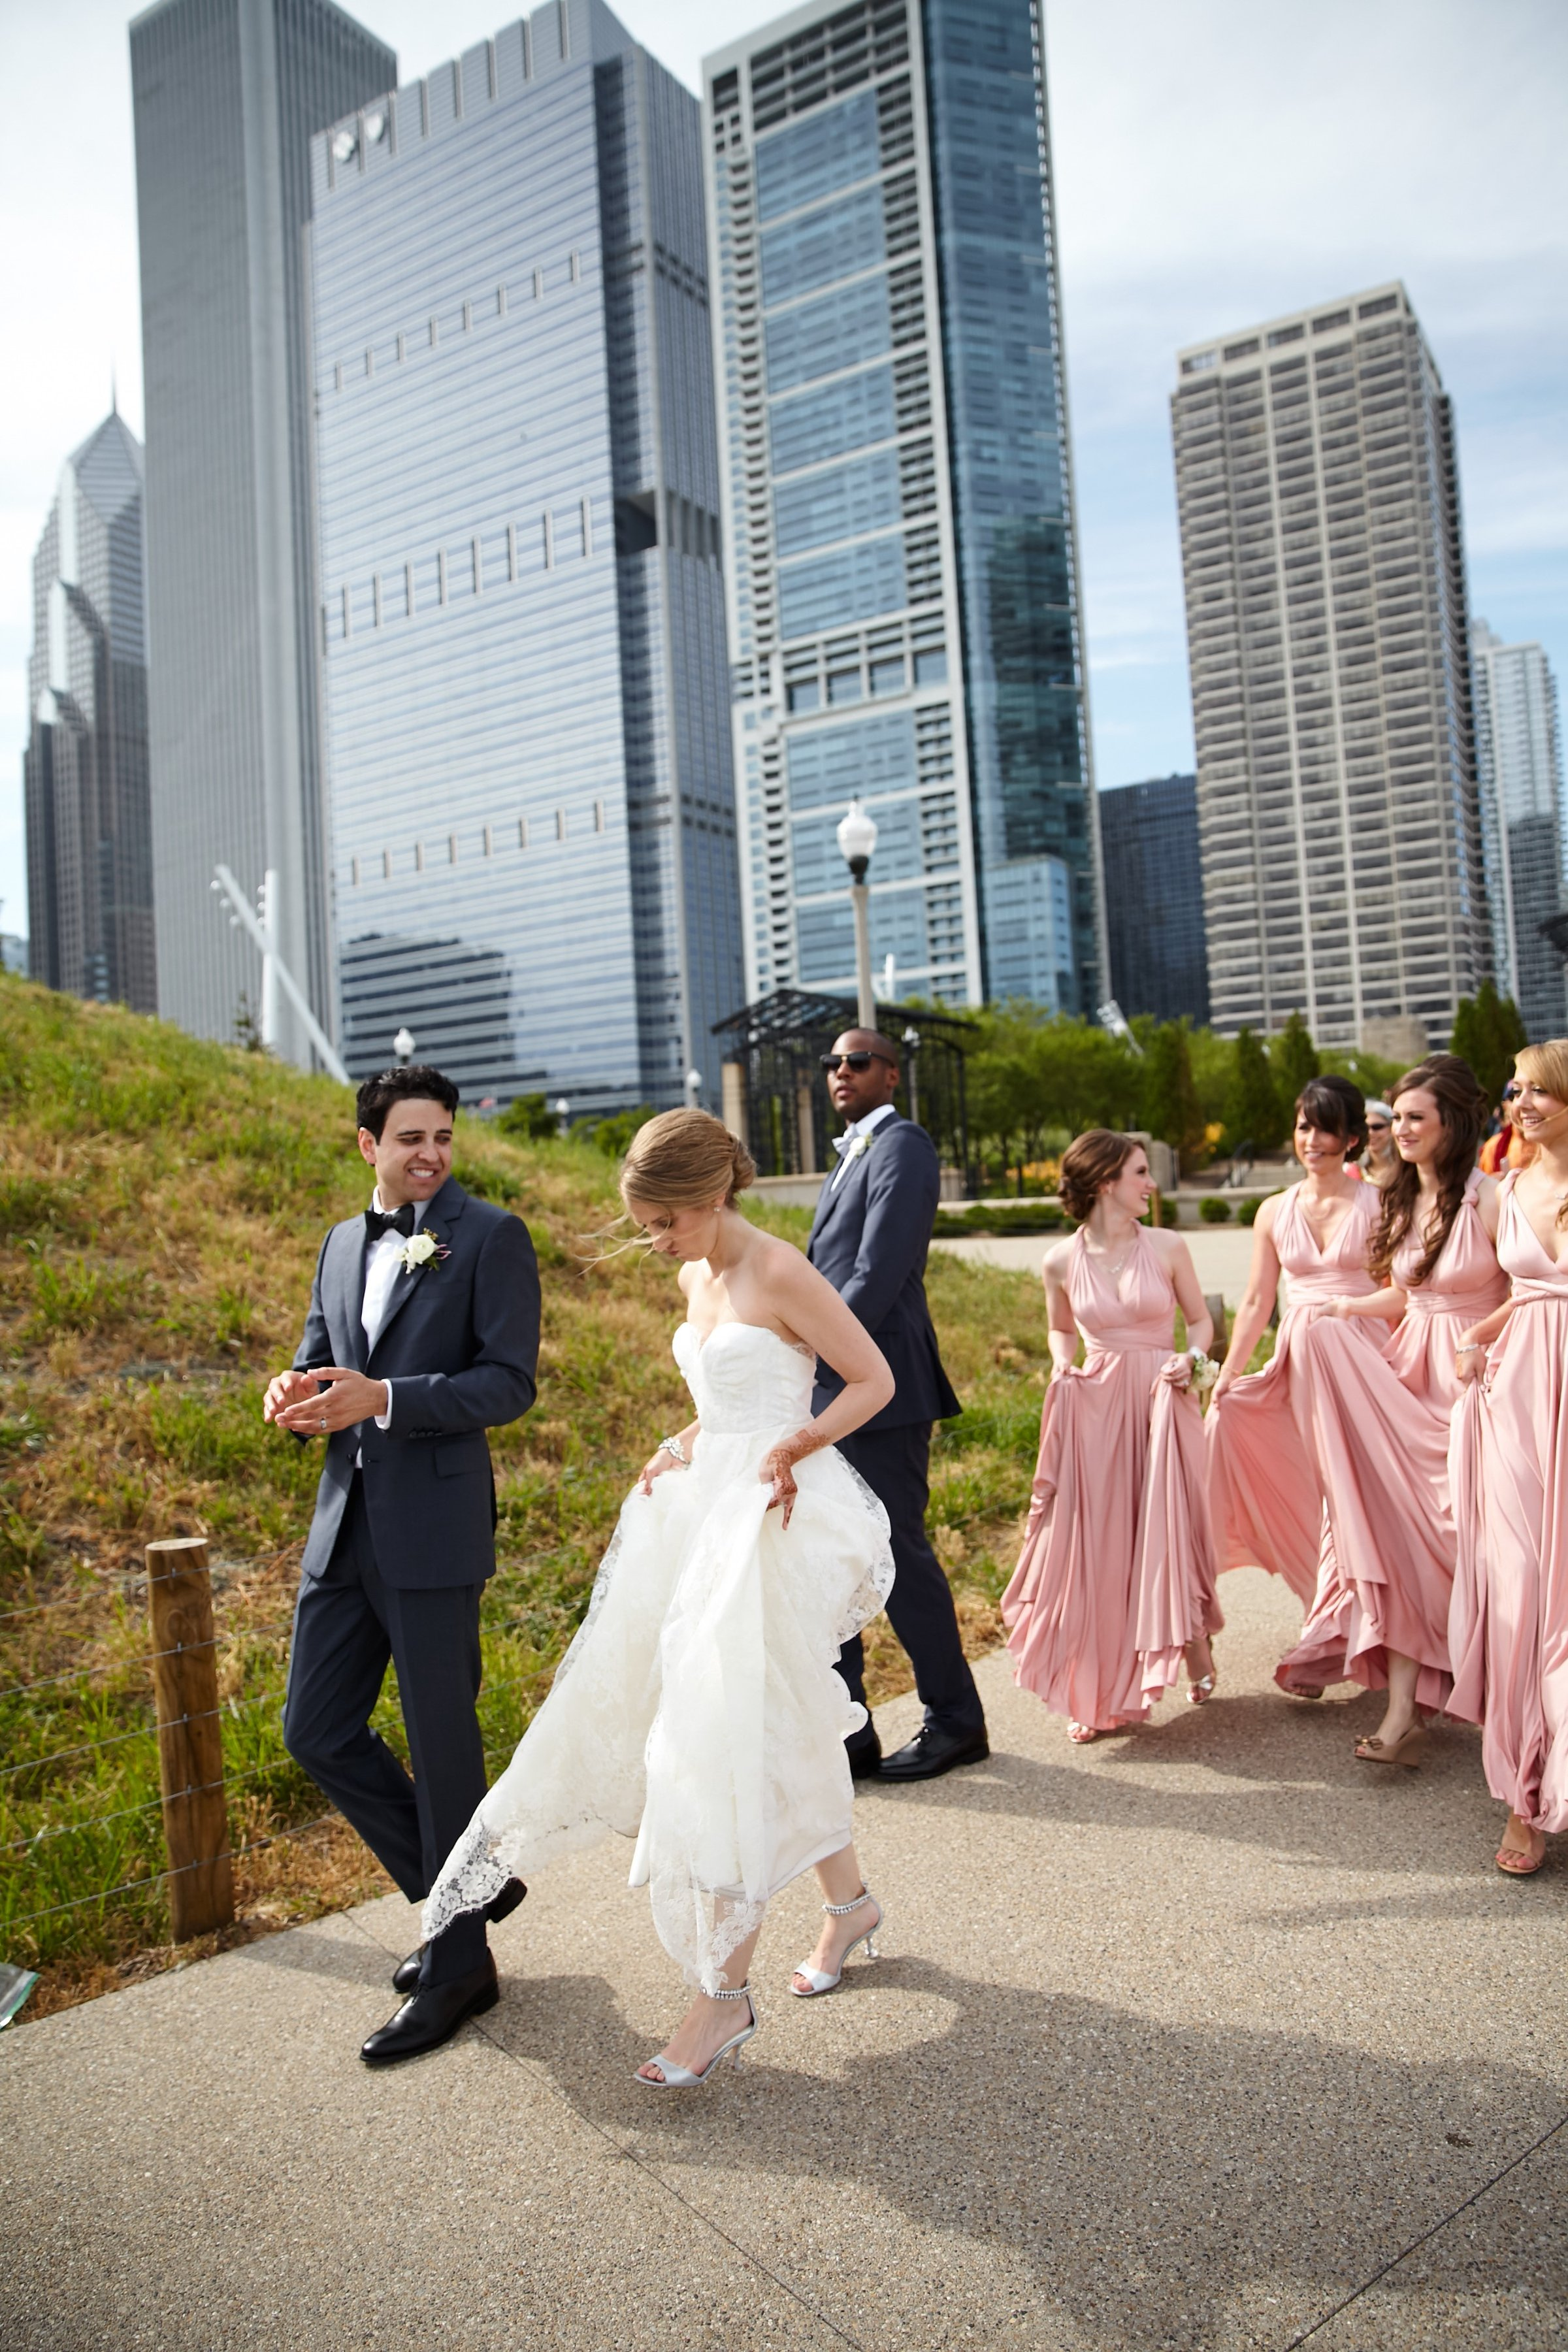 bride and groom, pink bridesmaid dresses, Cancer Survivor Park, Wrap It Up Parties